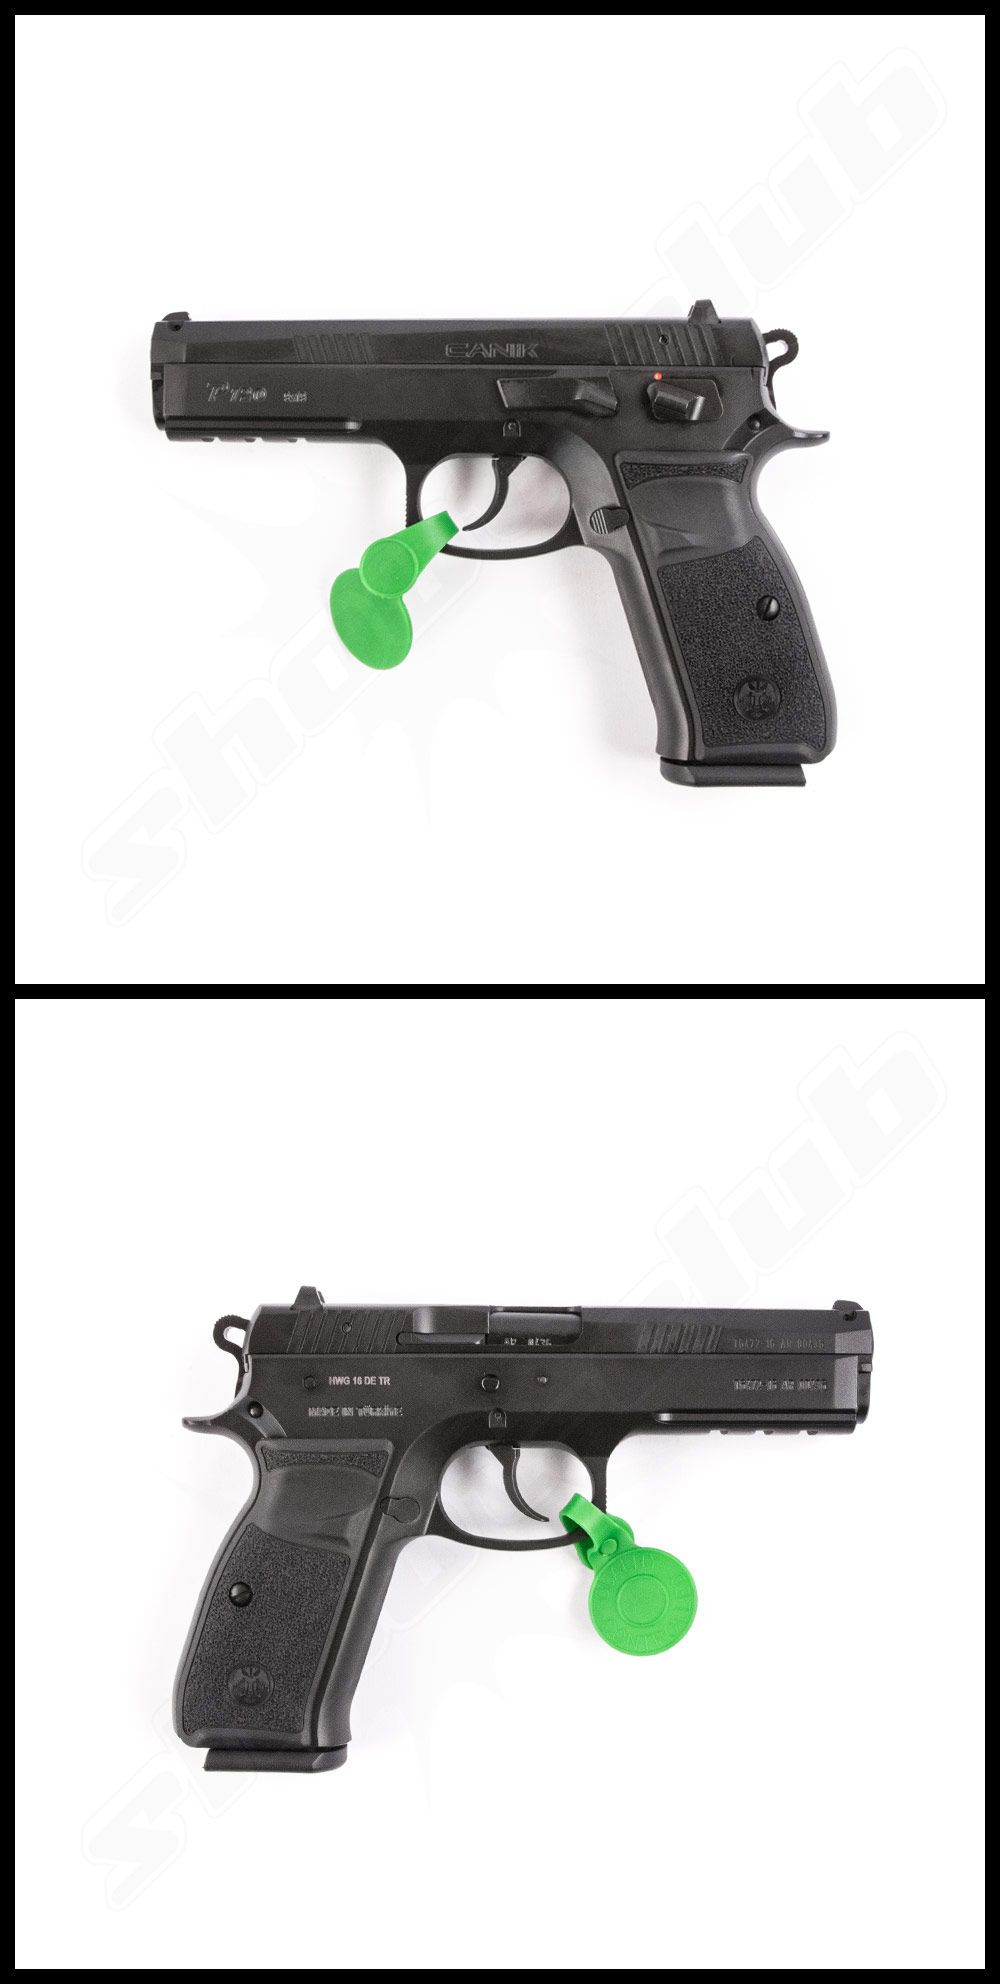 Pistole Canik P120 Steel Frame im Kaliber 9mm   SCHIESSSPORT & JAGD ...